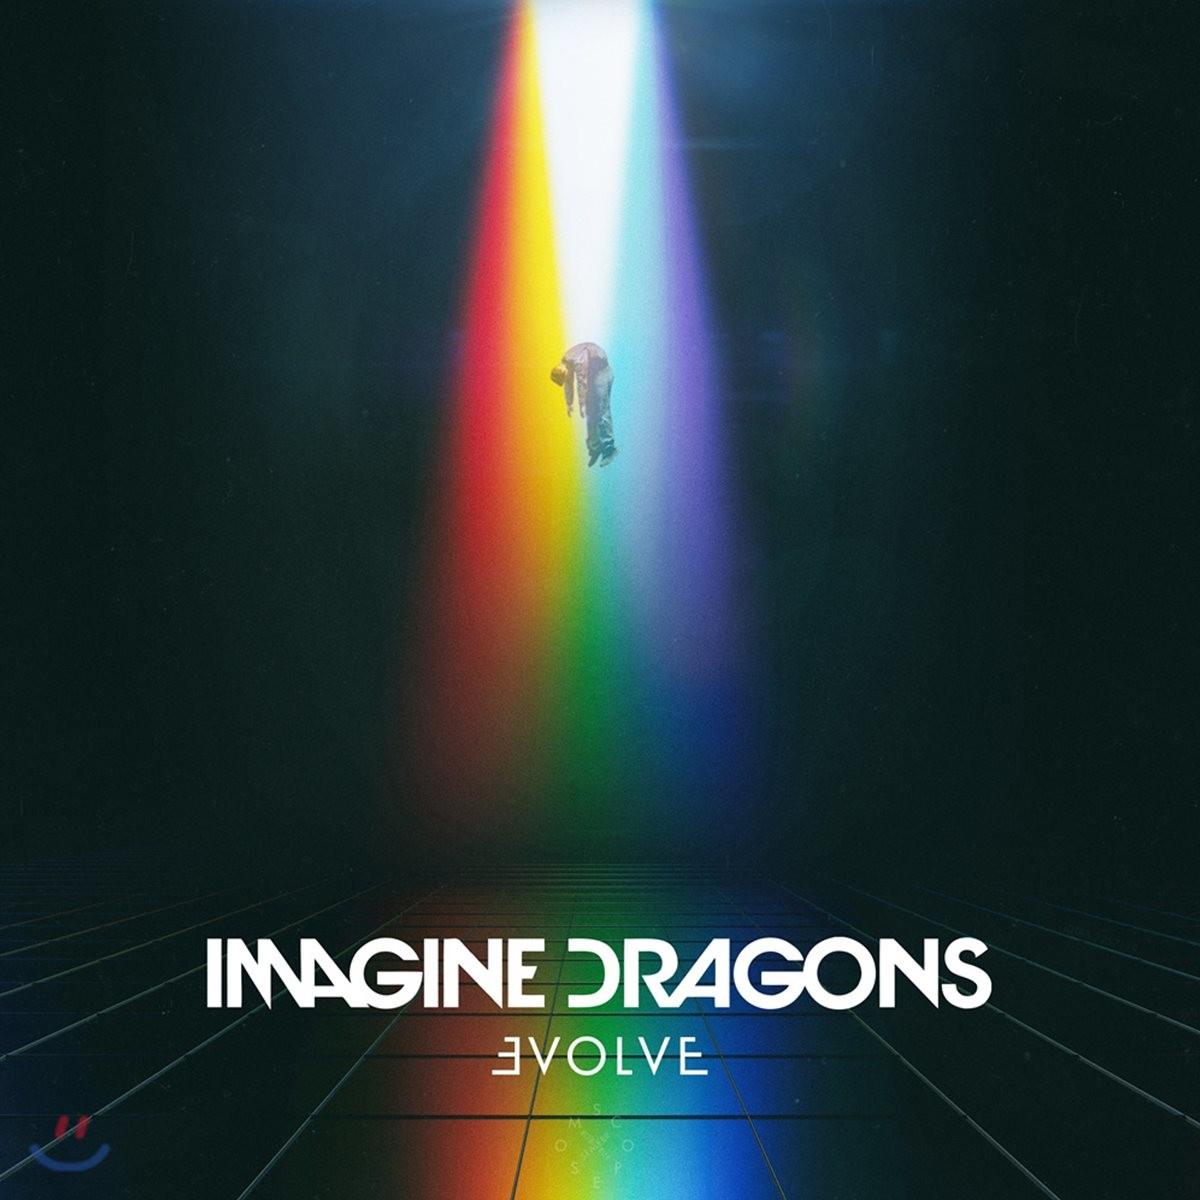 Imagine Dragons (이매진 드래곤스) - Evolve [Deluxe Edition]